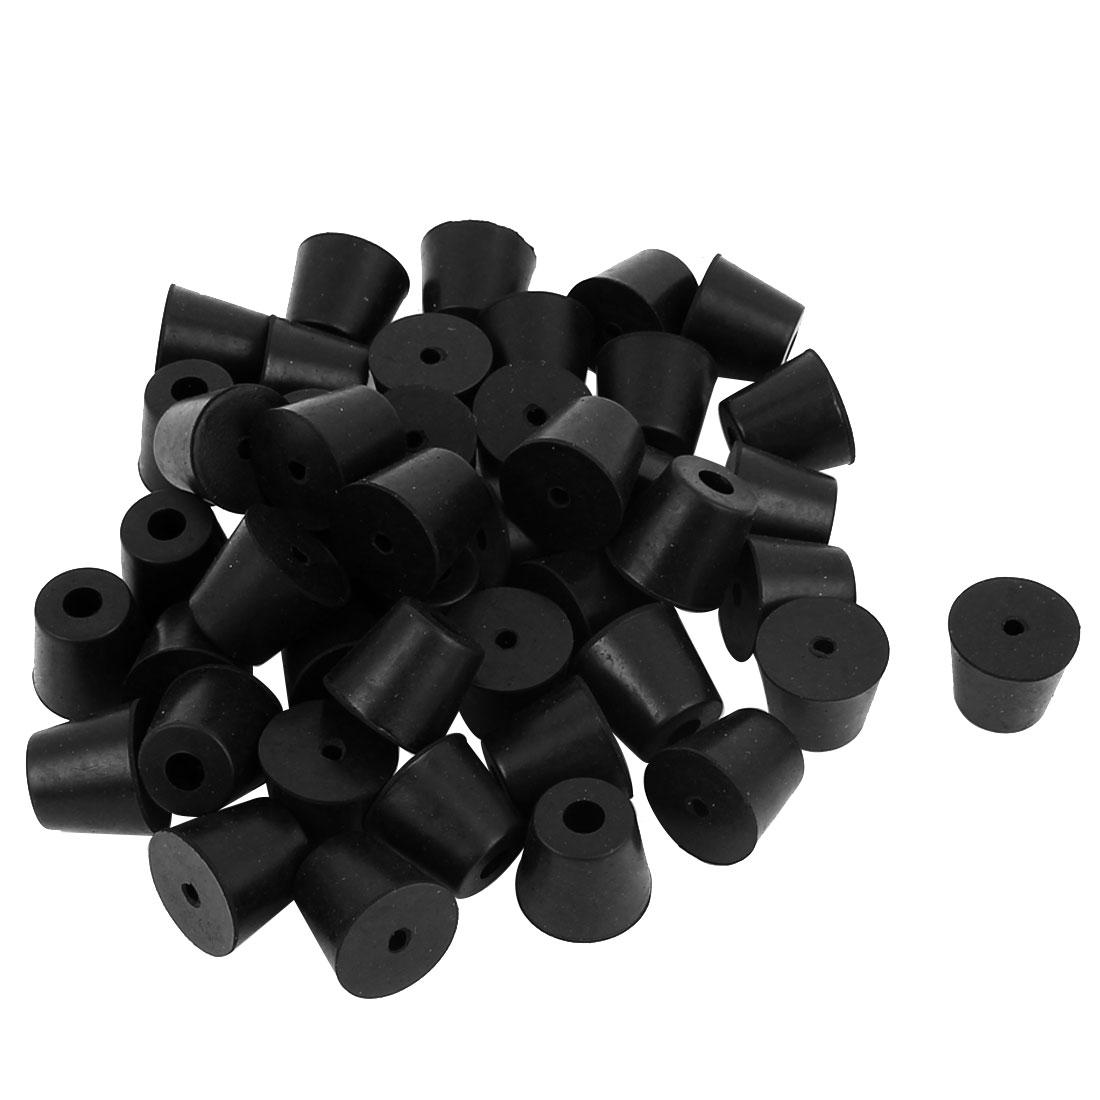 45 Pcs 20mm x 17mm Conical Rubber Furniture Bumper Foot Cover Pad Black